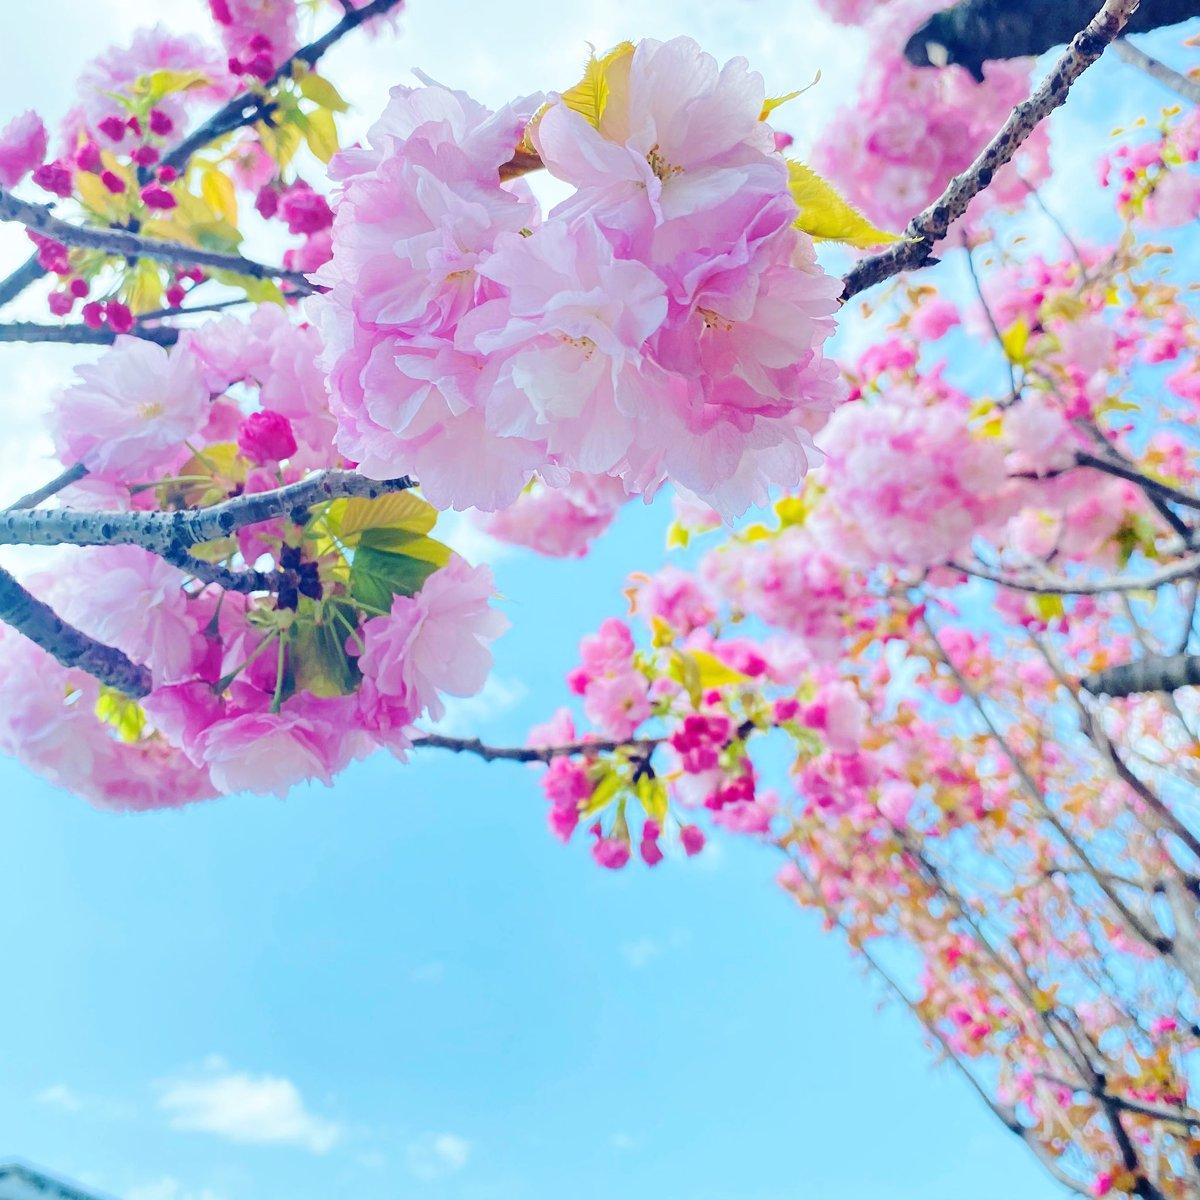 #SAKURA 2021⬇️   #photooftheday #bloom #Flowers of  #tree  #Japan #Japanese #beauty